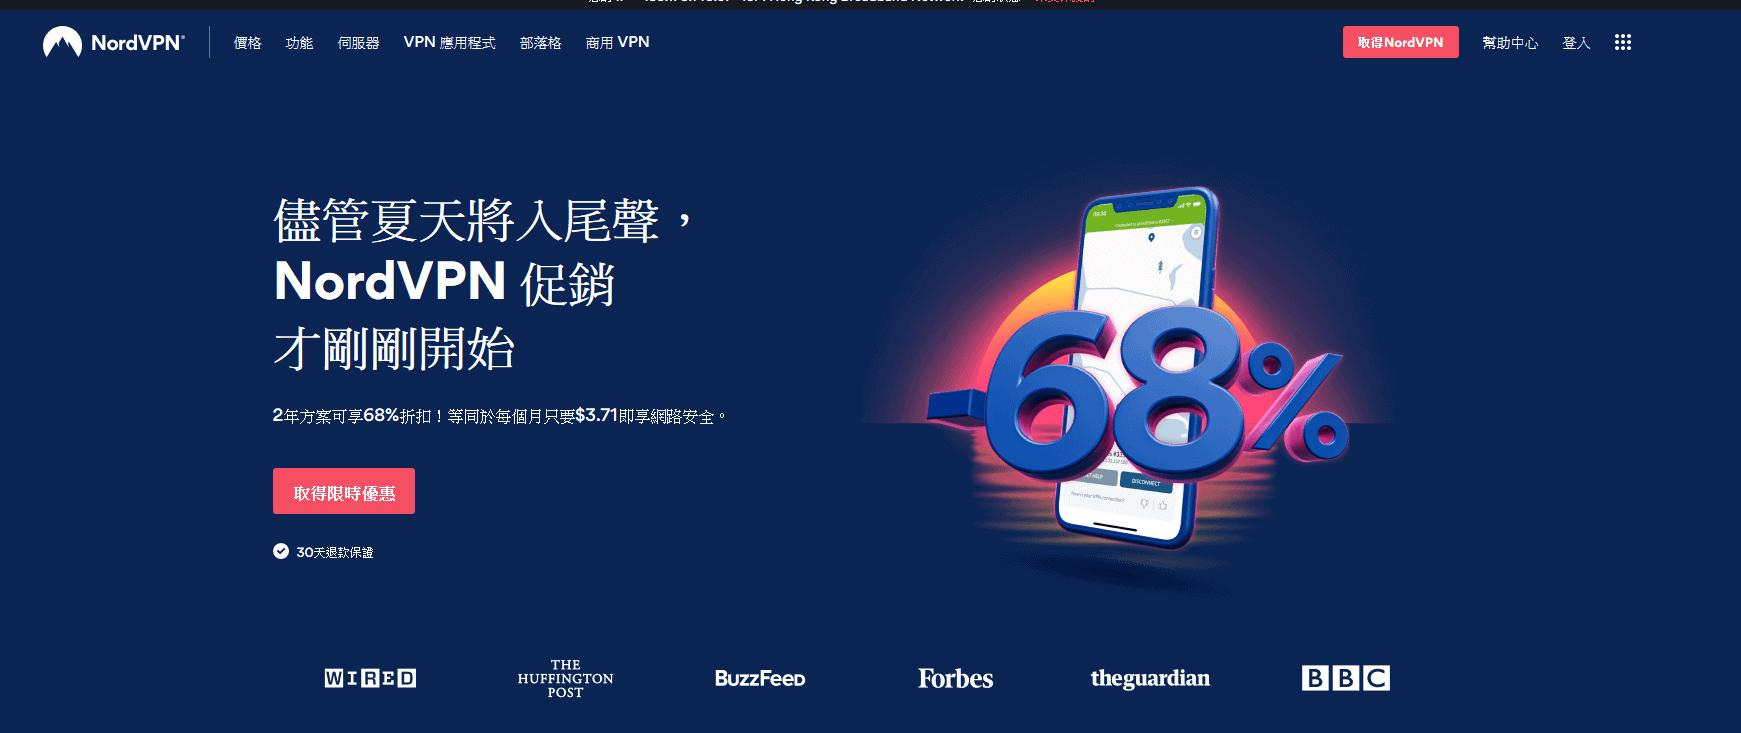 【VPN介紹】2020 最新NordVPN優惠@比官網3折更著數 (2020-10-07 更新)